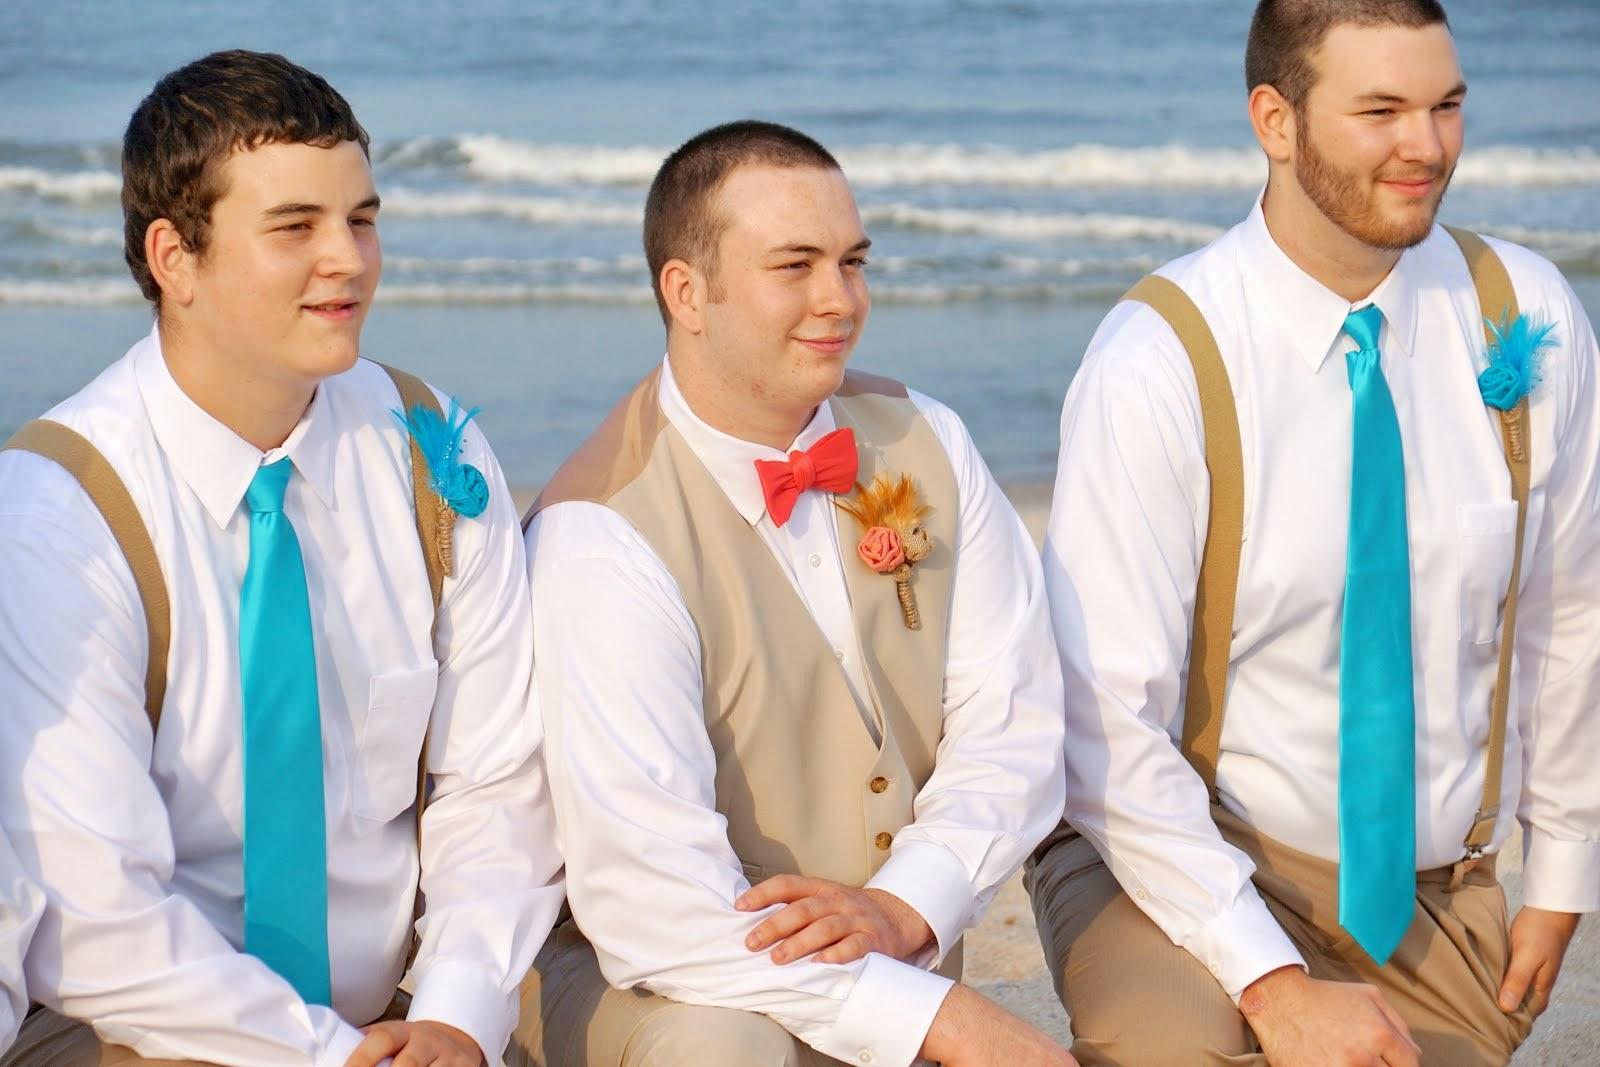 Austin, Jordan and Zach